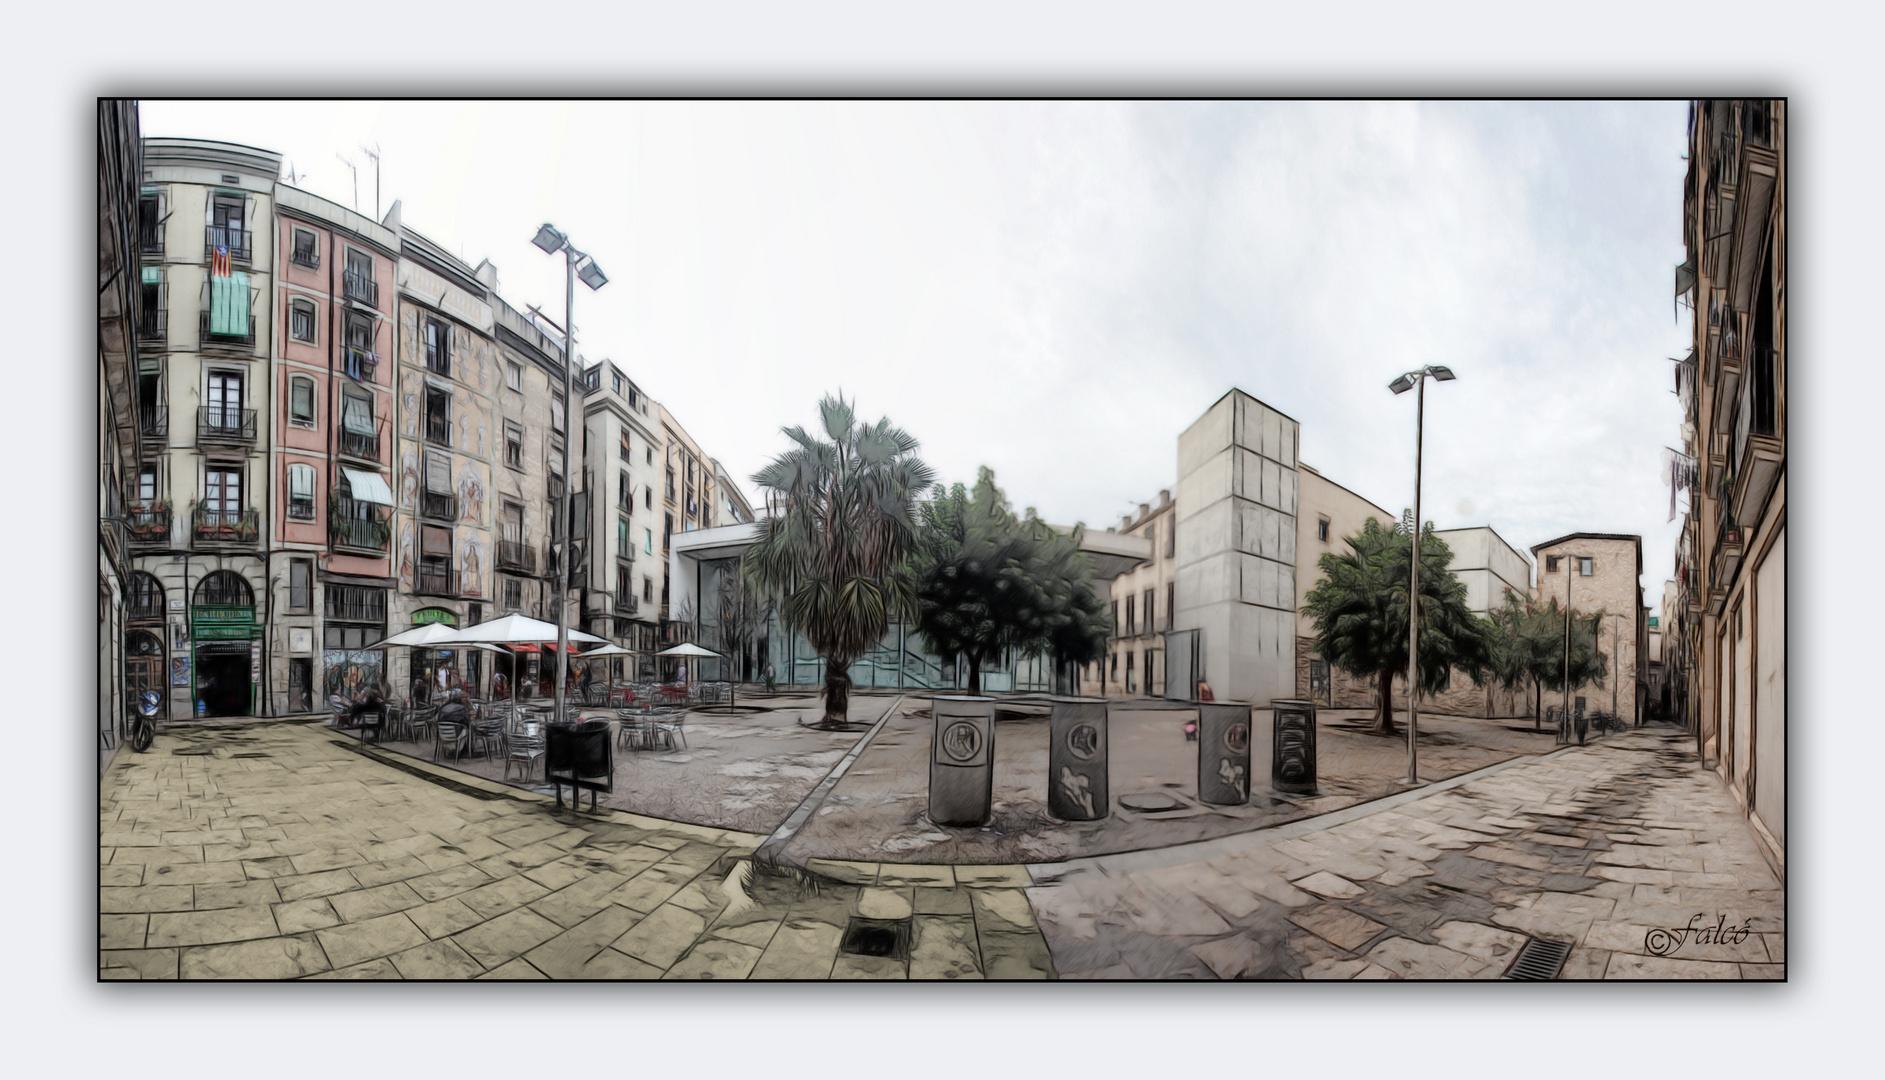 Plaça de Jaume Sabartés